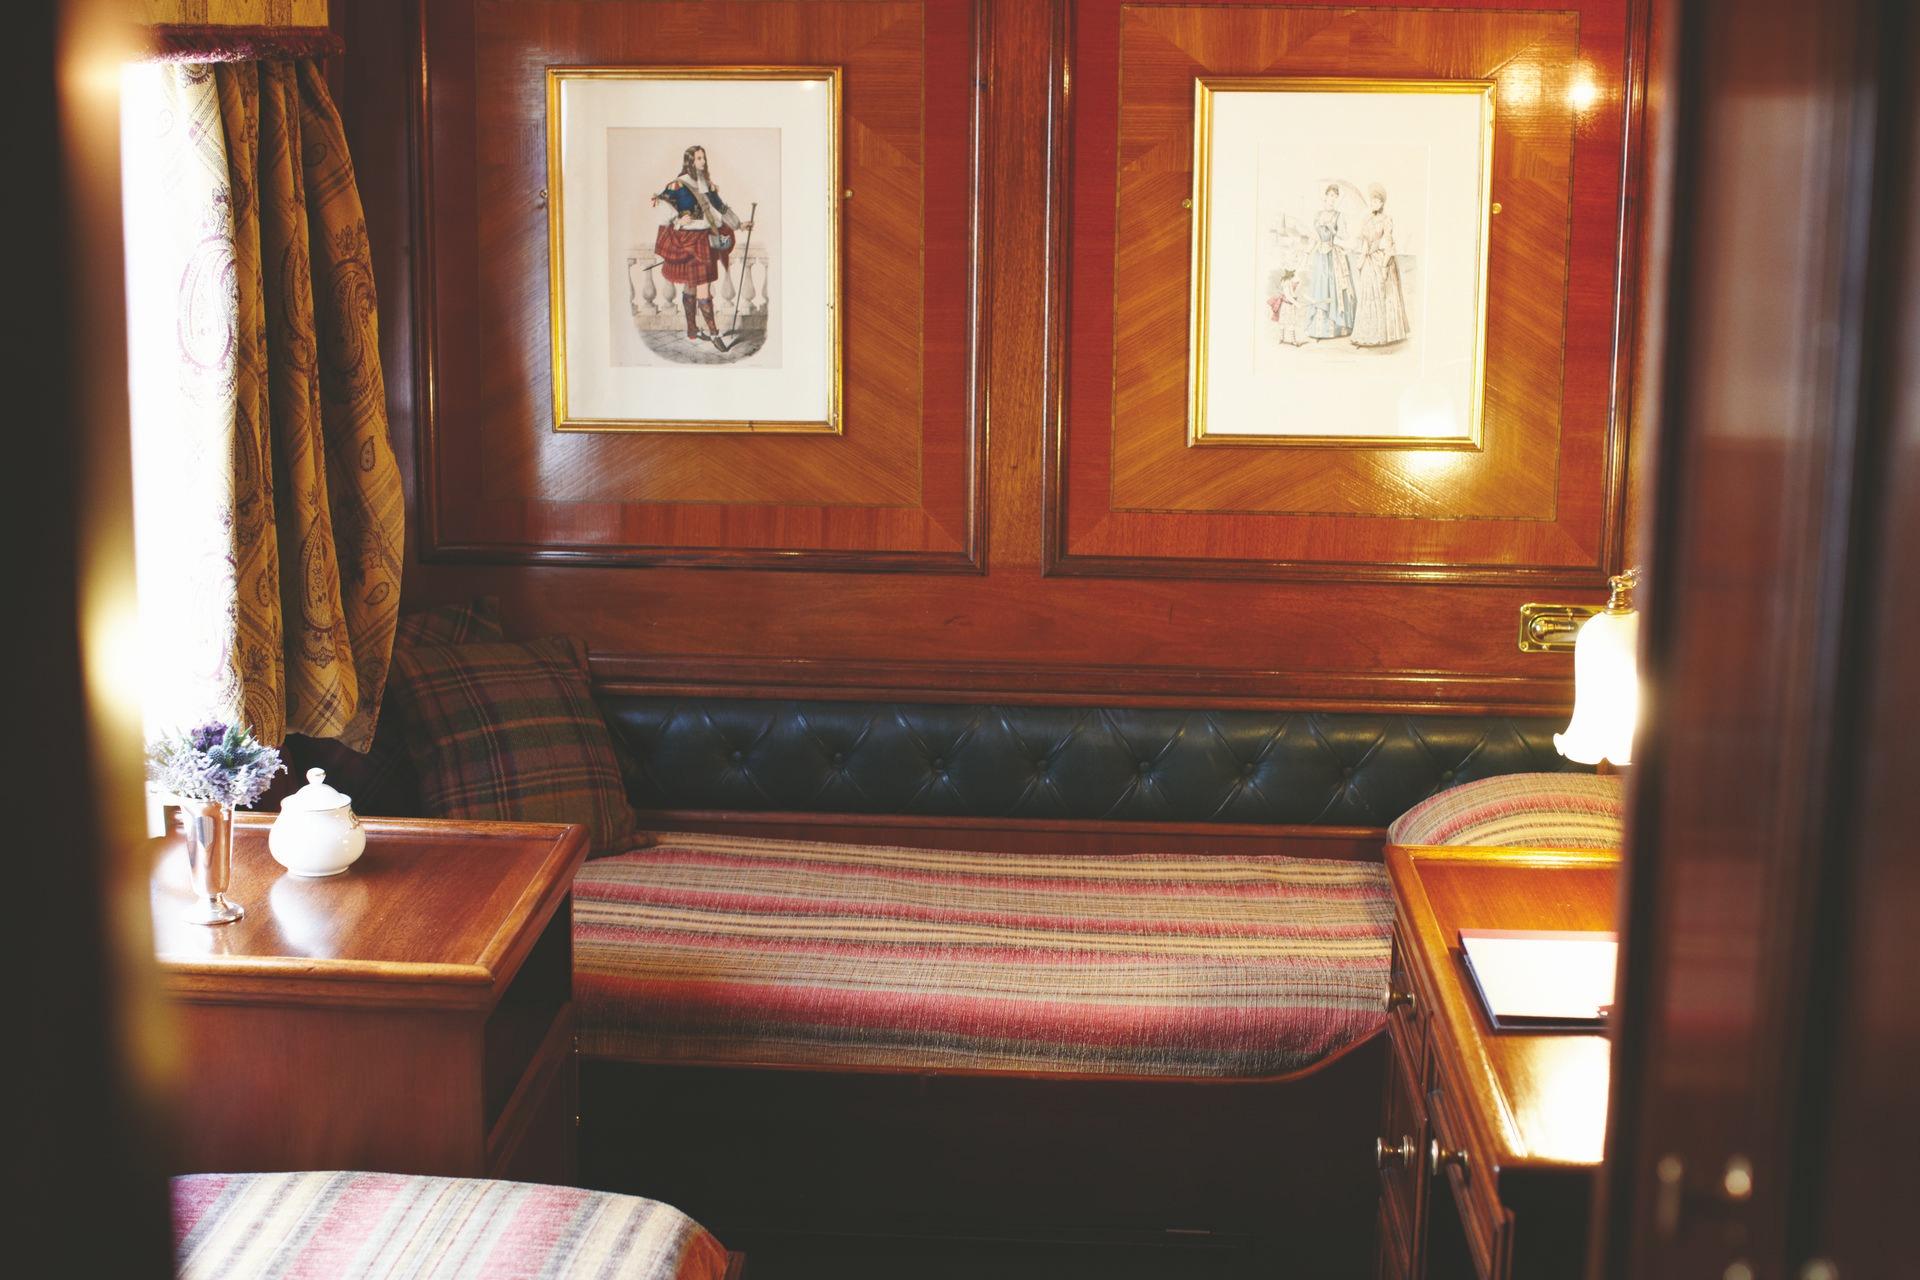 NOMAD-luksusowe-pociągi-Belmond-Royal-Scotsman-03-1